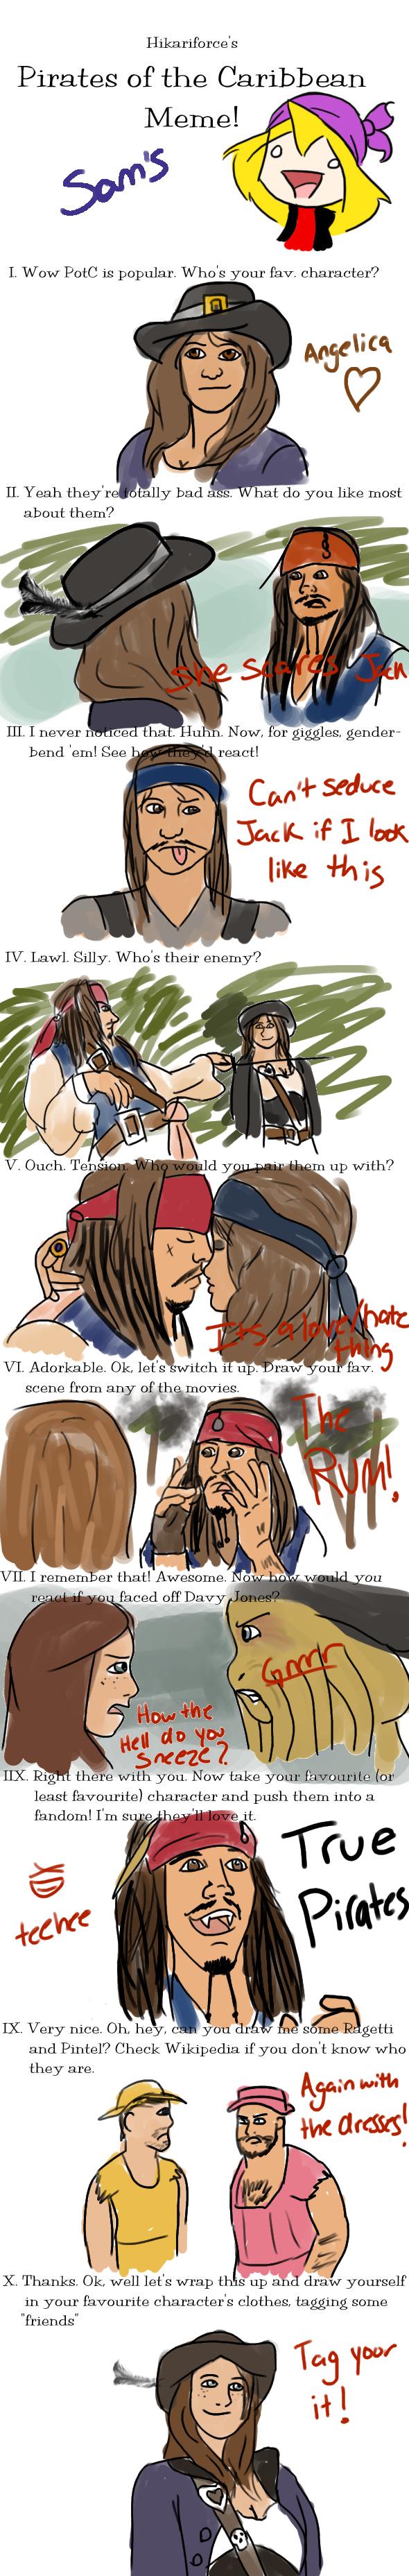 Pirates Meme by sbrigs on DeviantArt